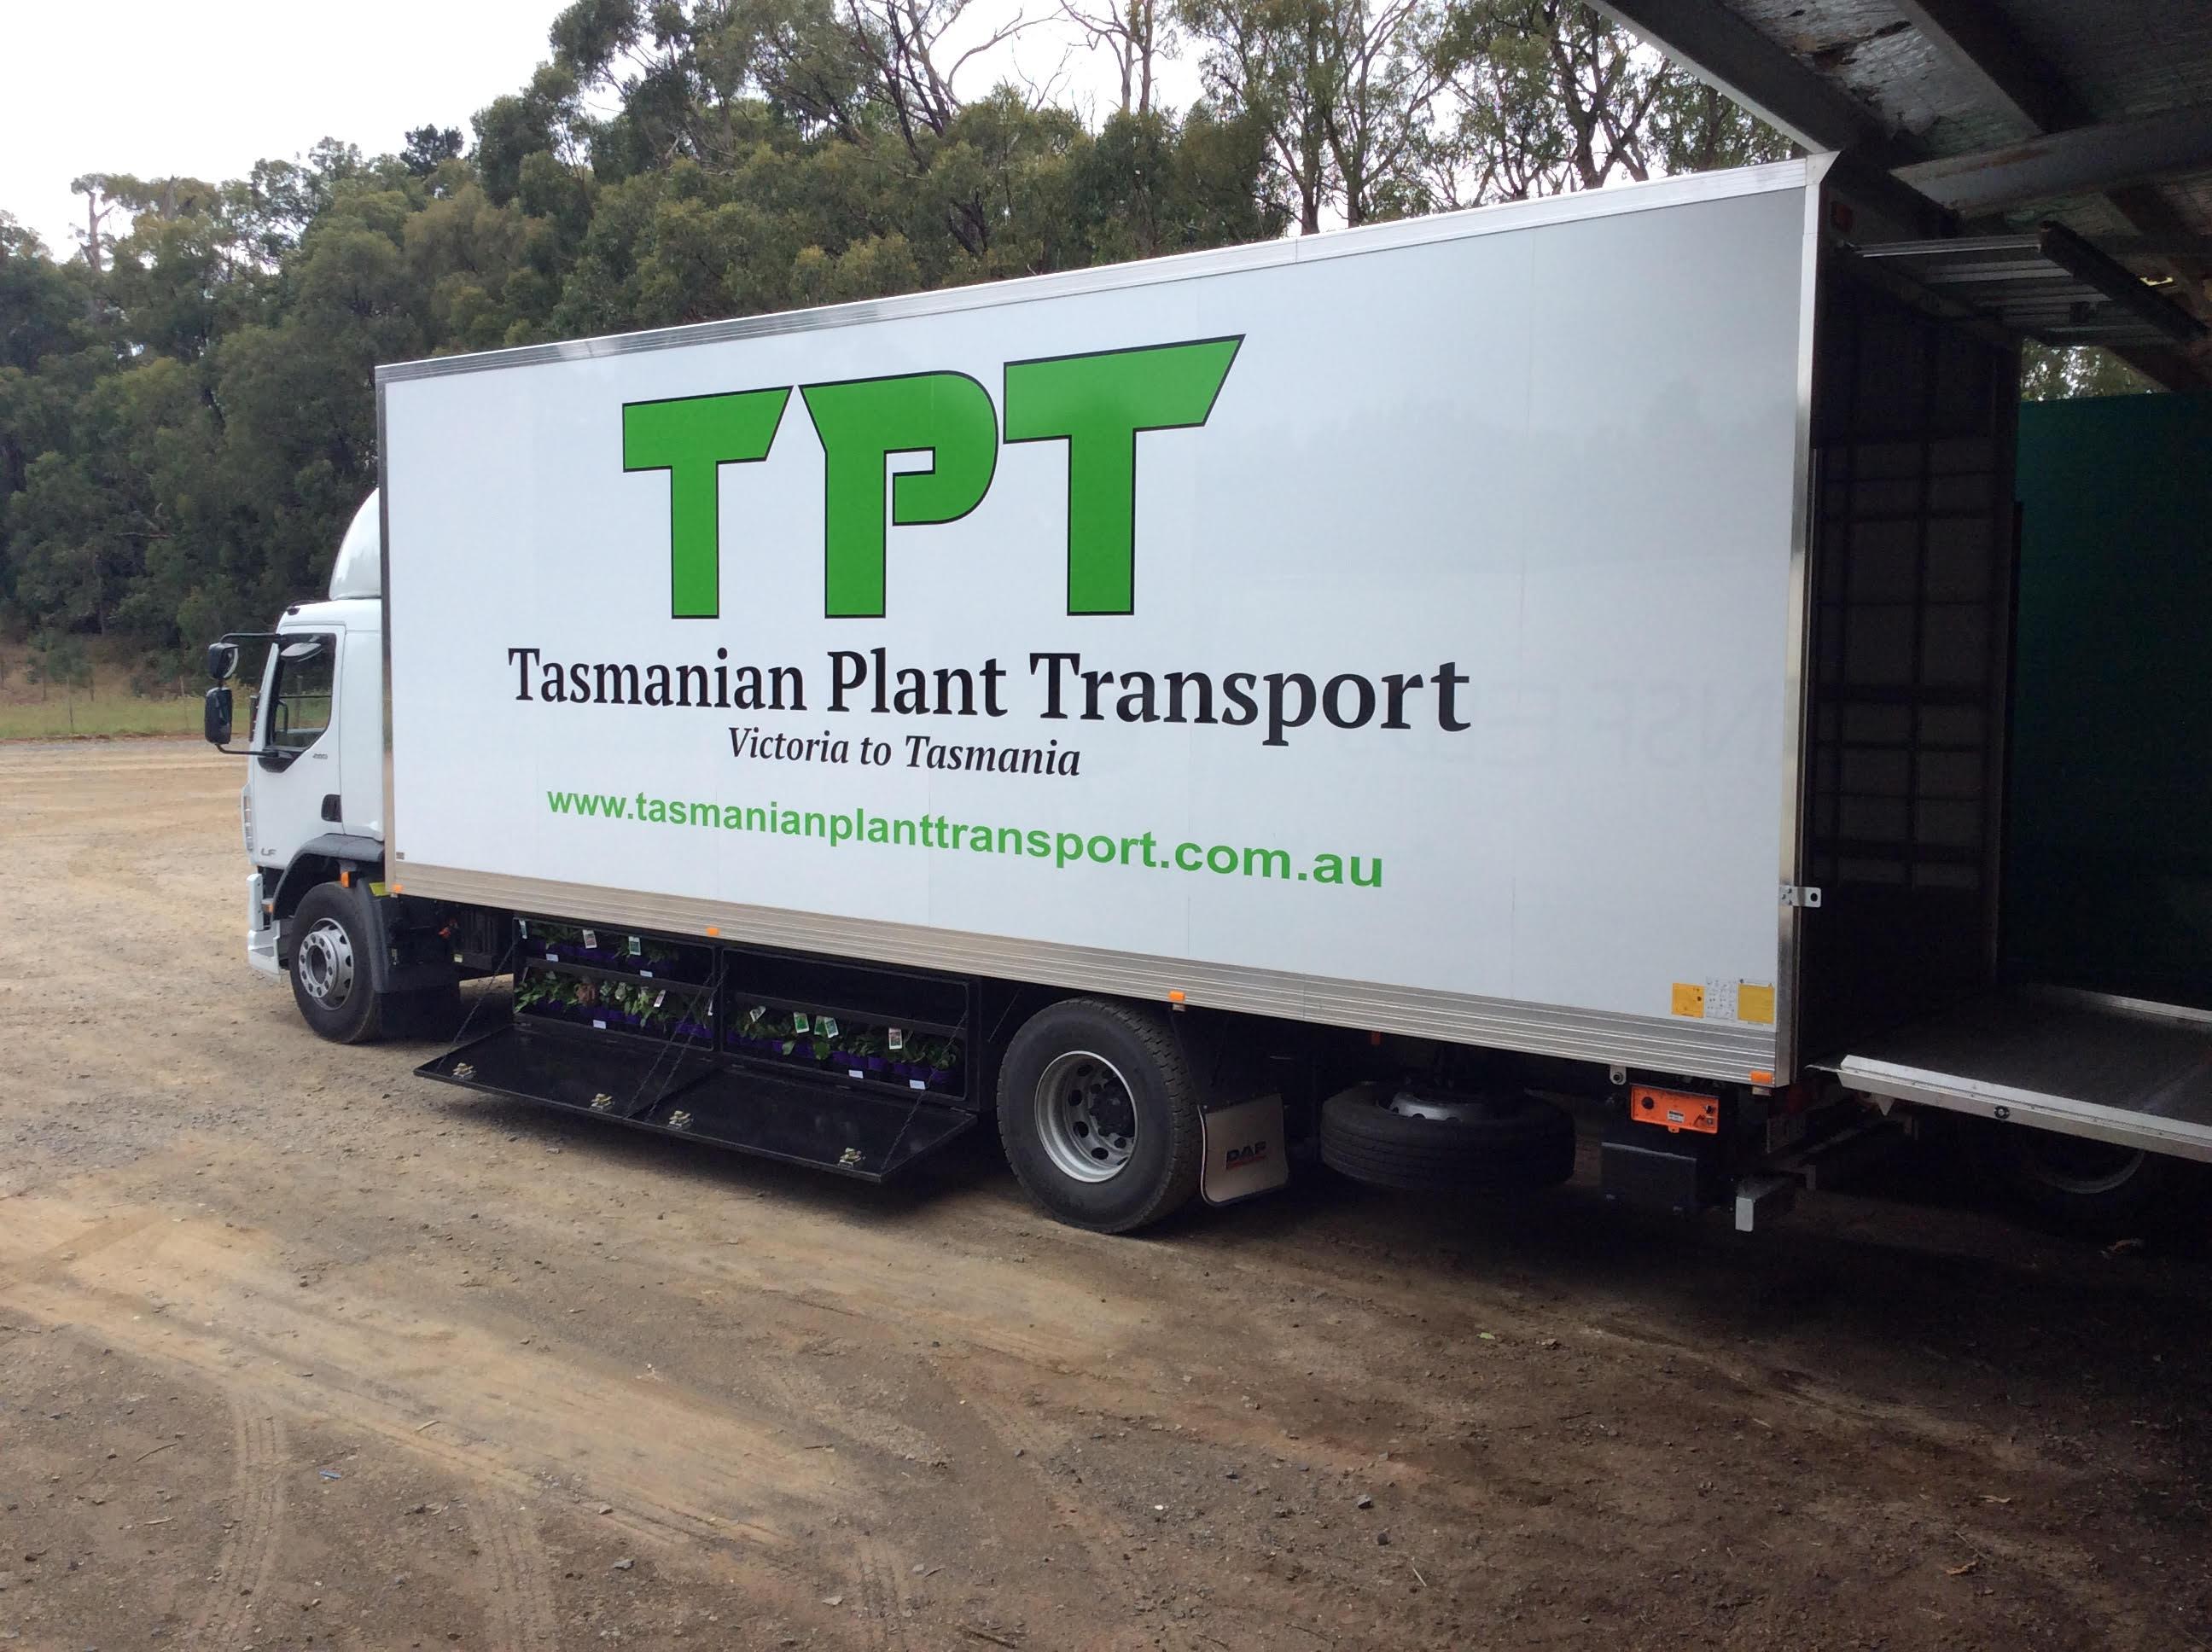 Tasmanian Plant Transport truck.